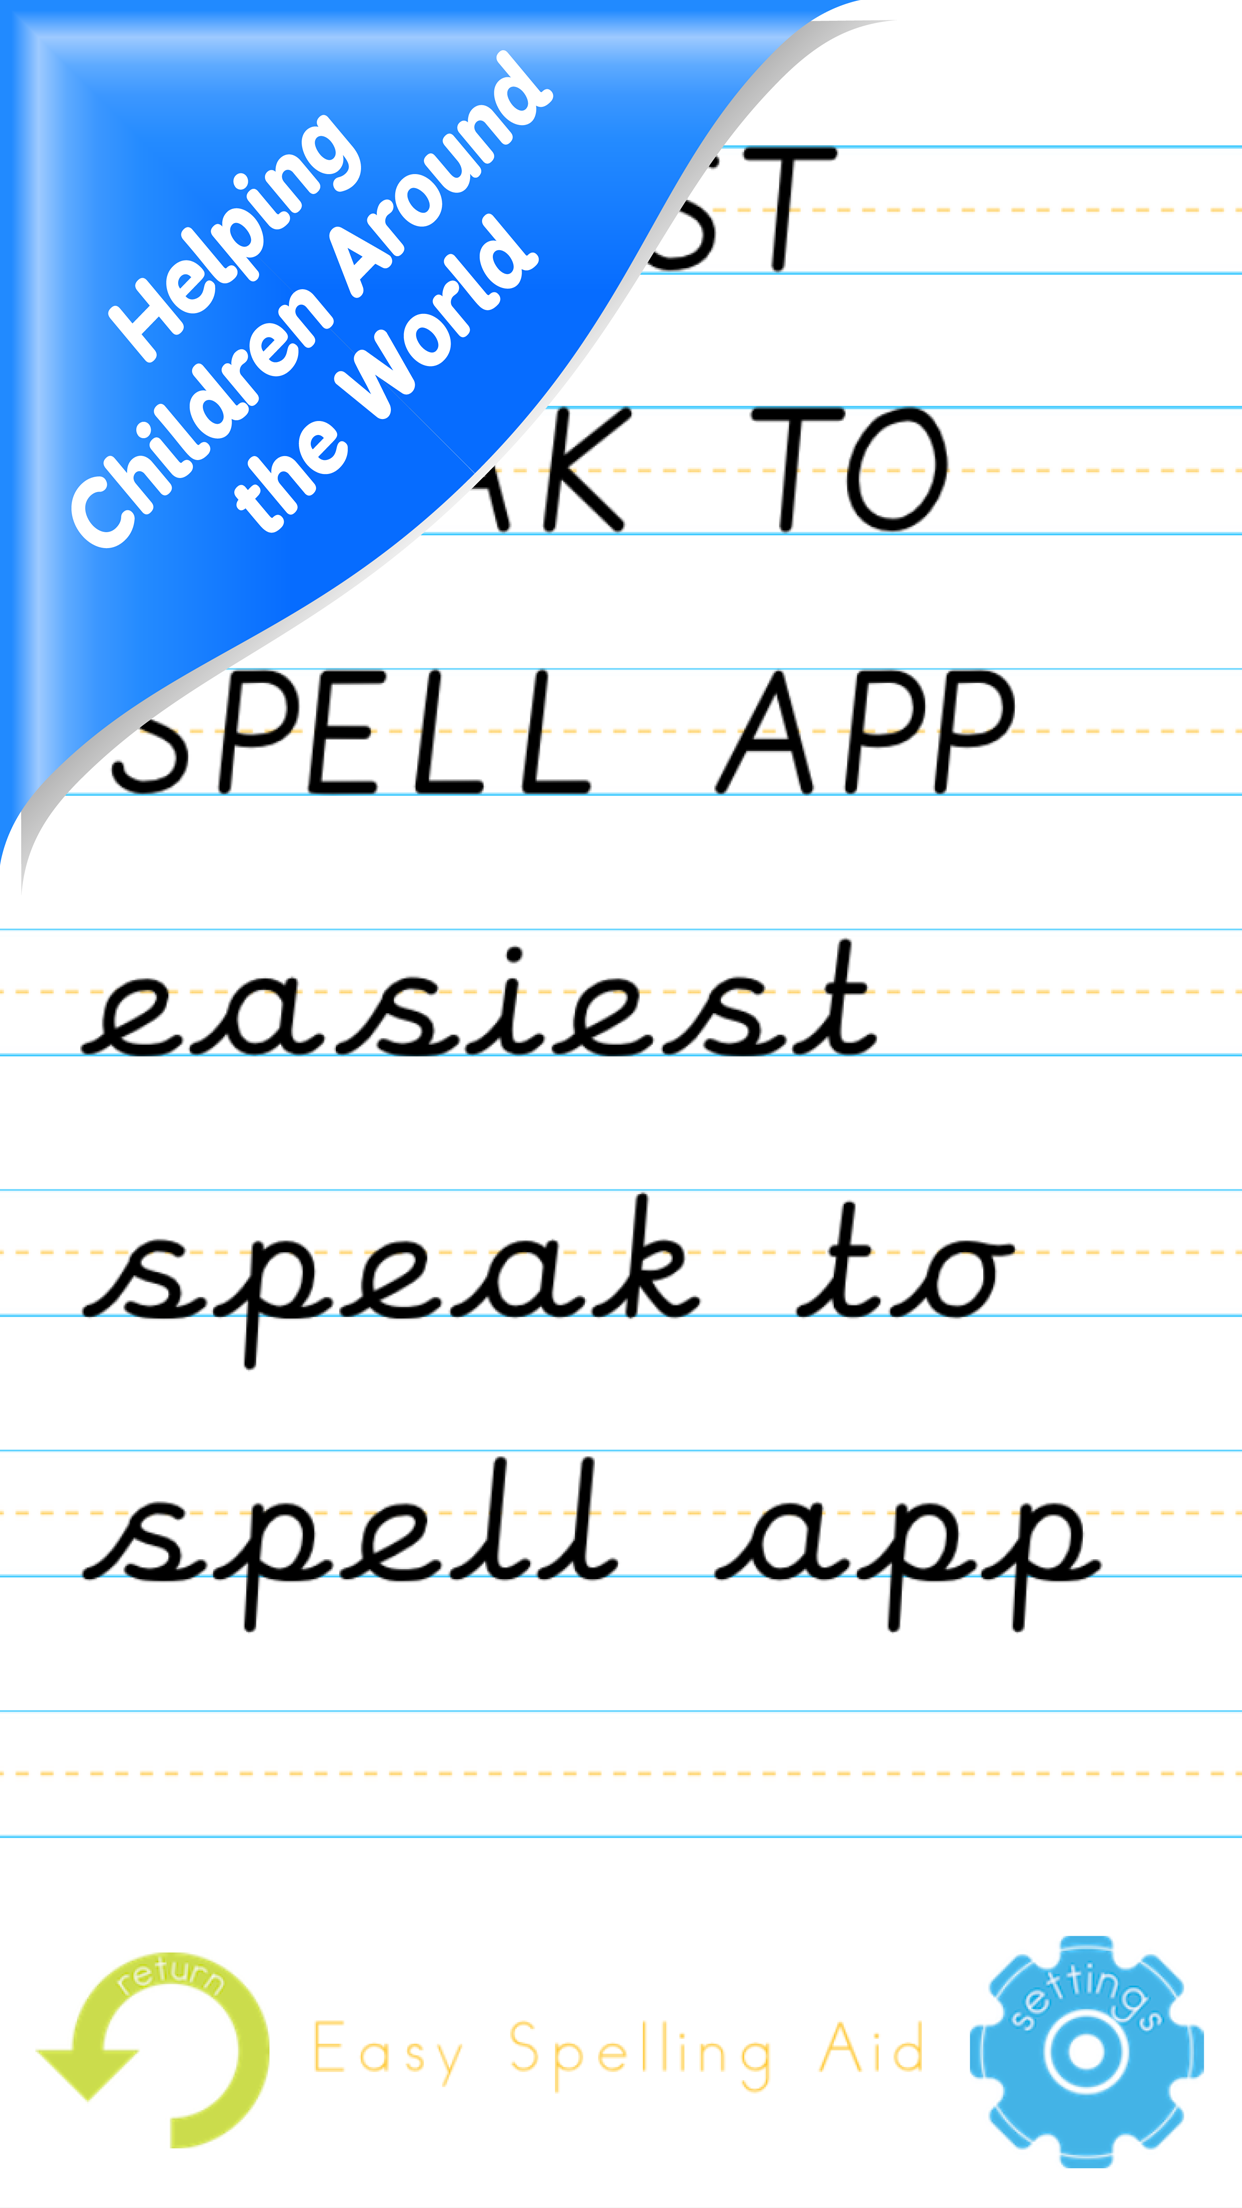 Easy Spelling Aid-1